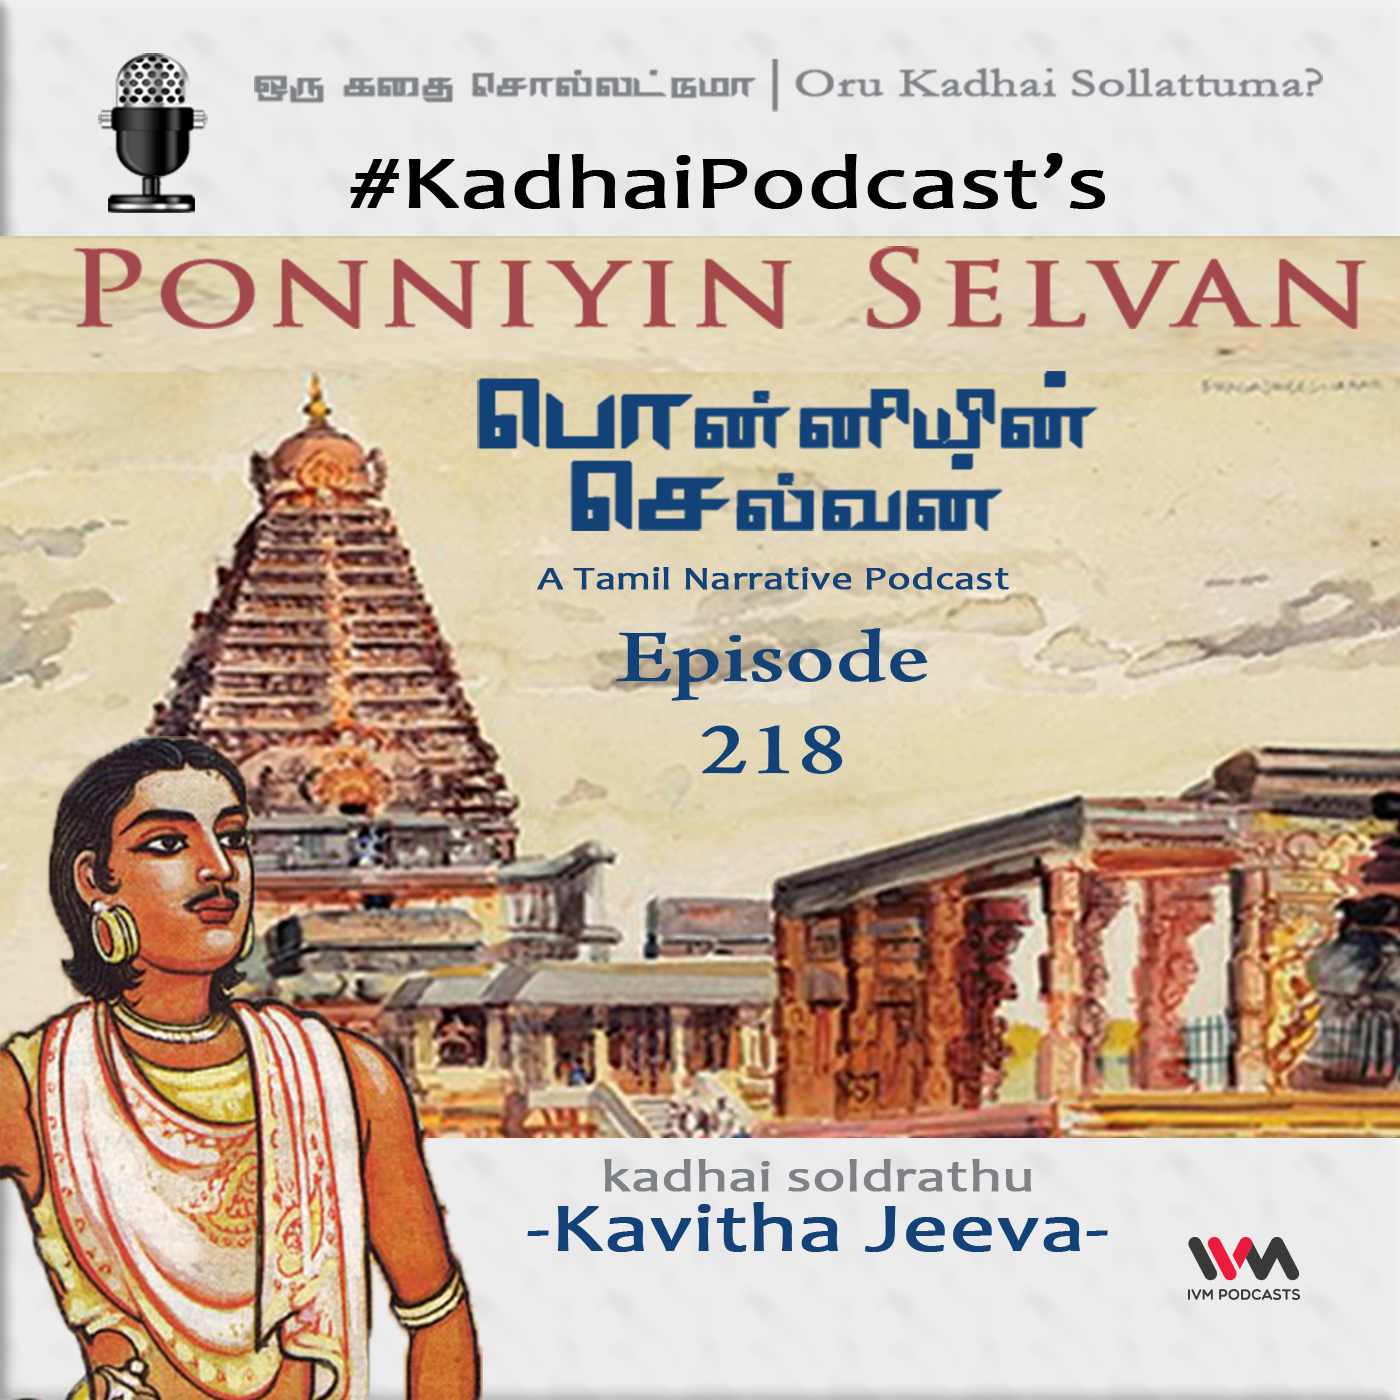 KadhaiPodcast's Ponniyin Selvan - Episode # 218